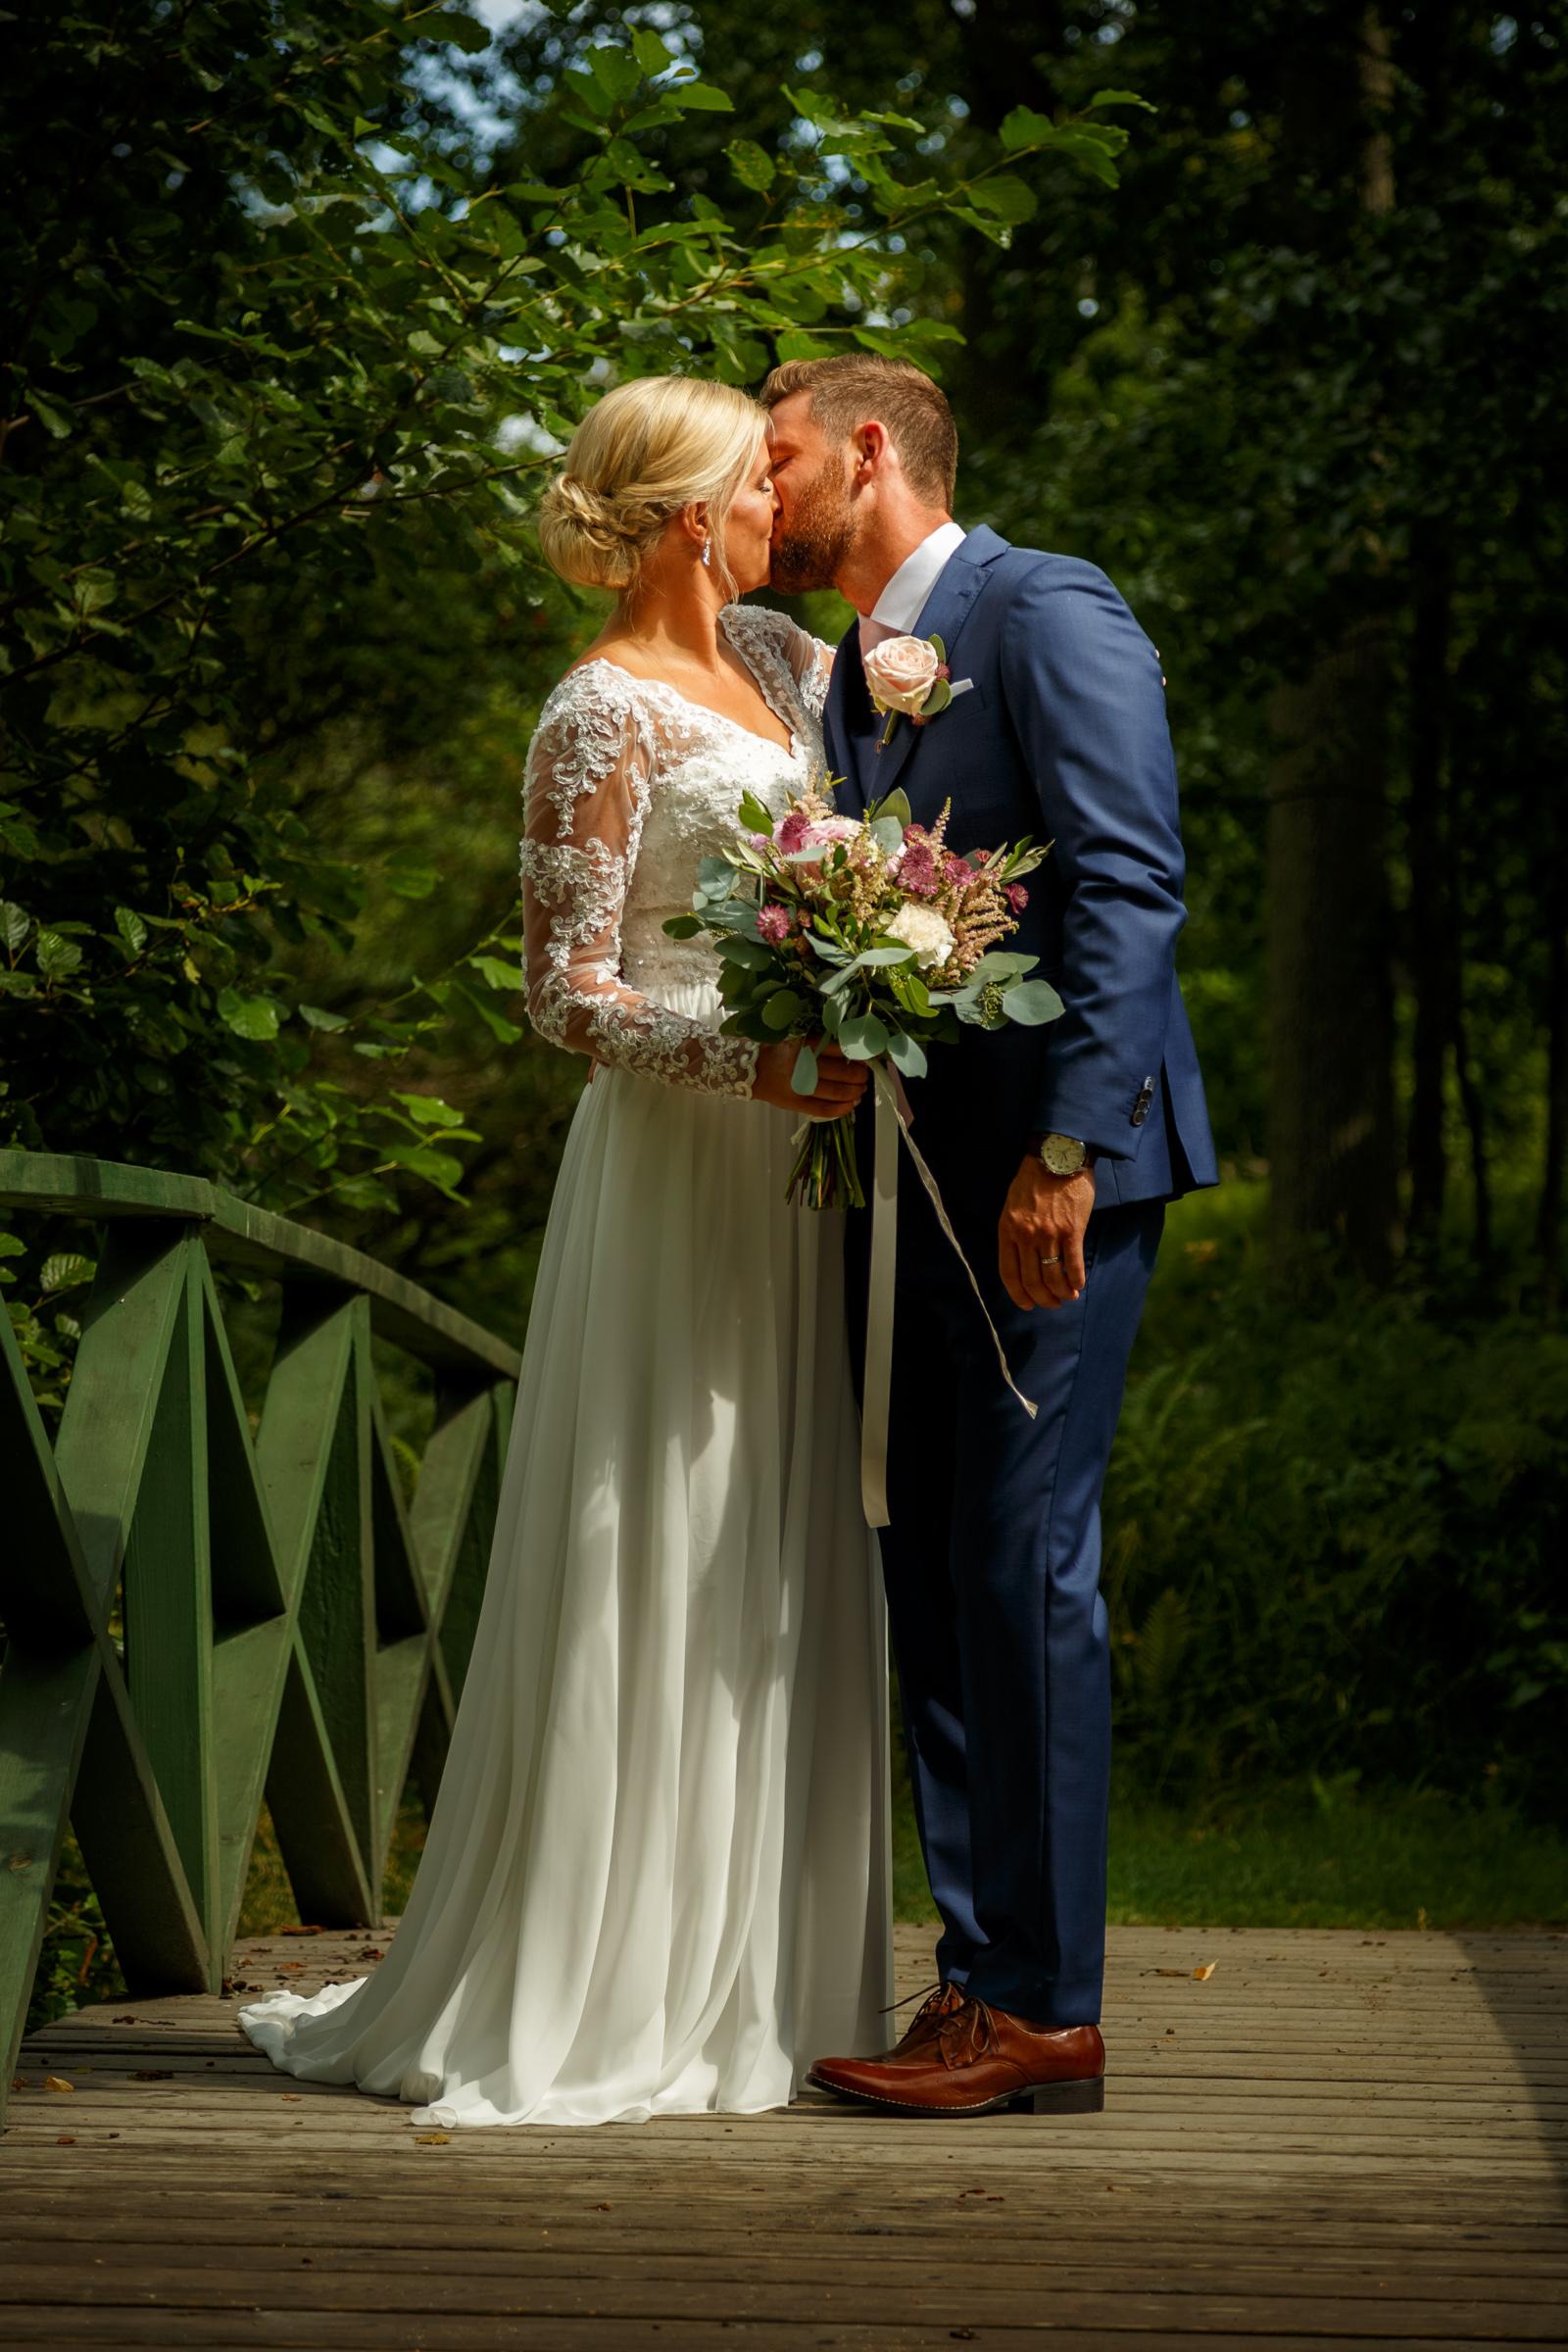 20180714-örebro-bröllop-306.jpg